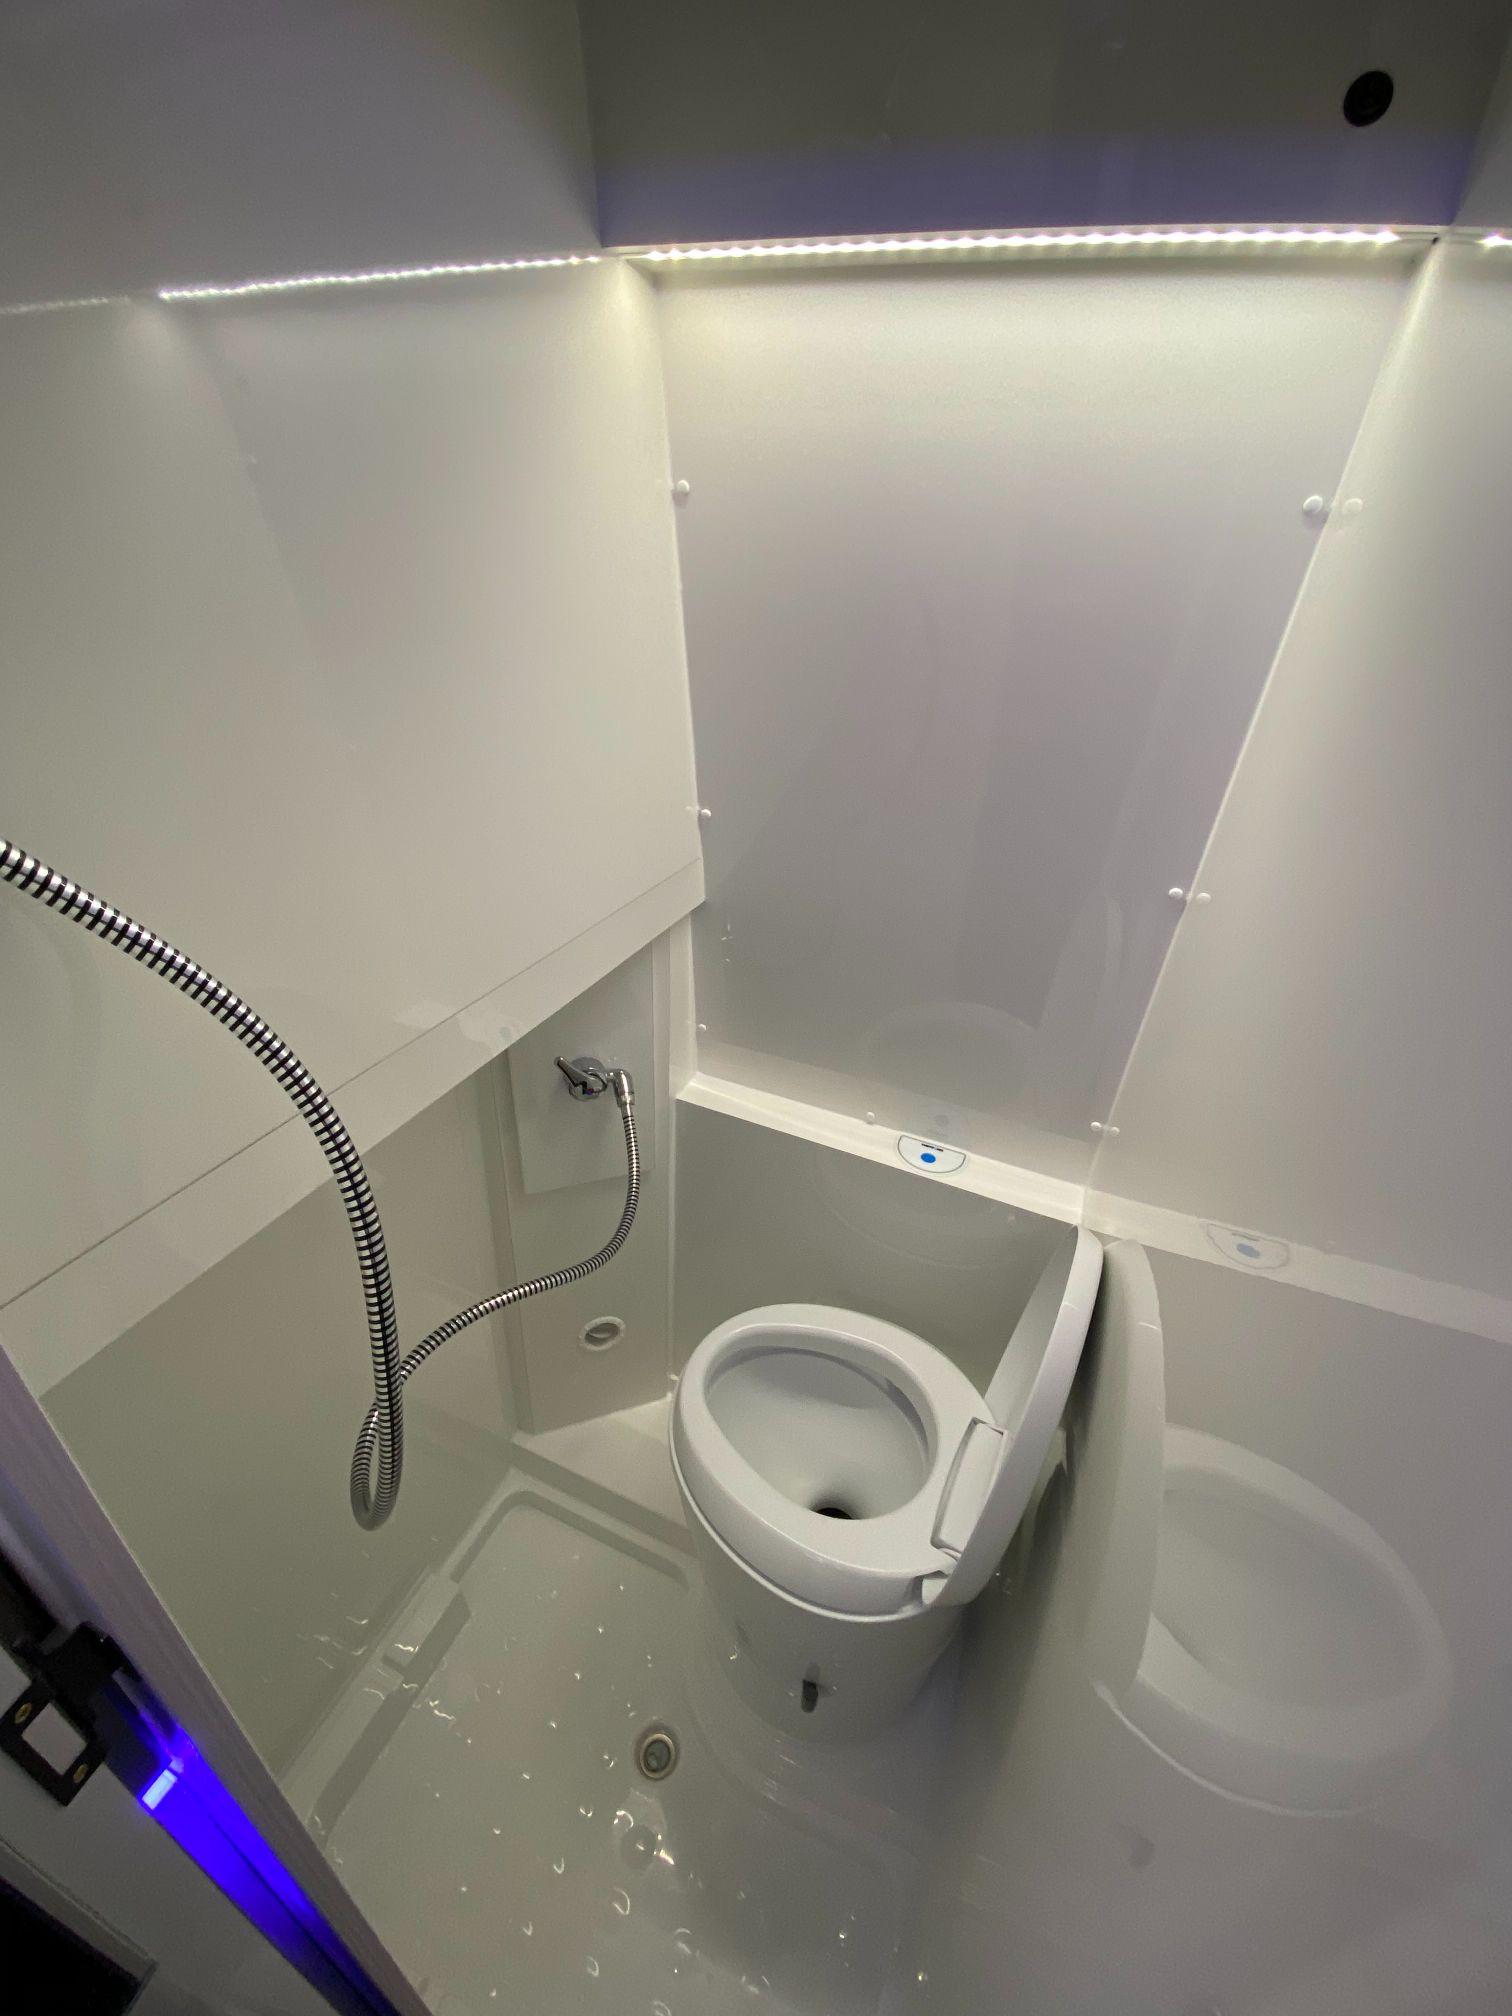 MAN M6 Toilette